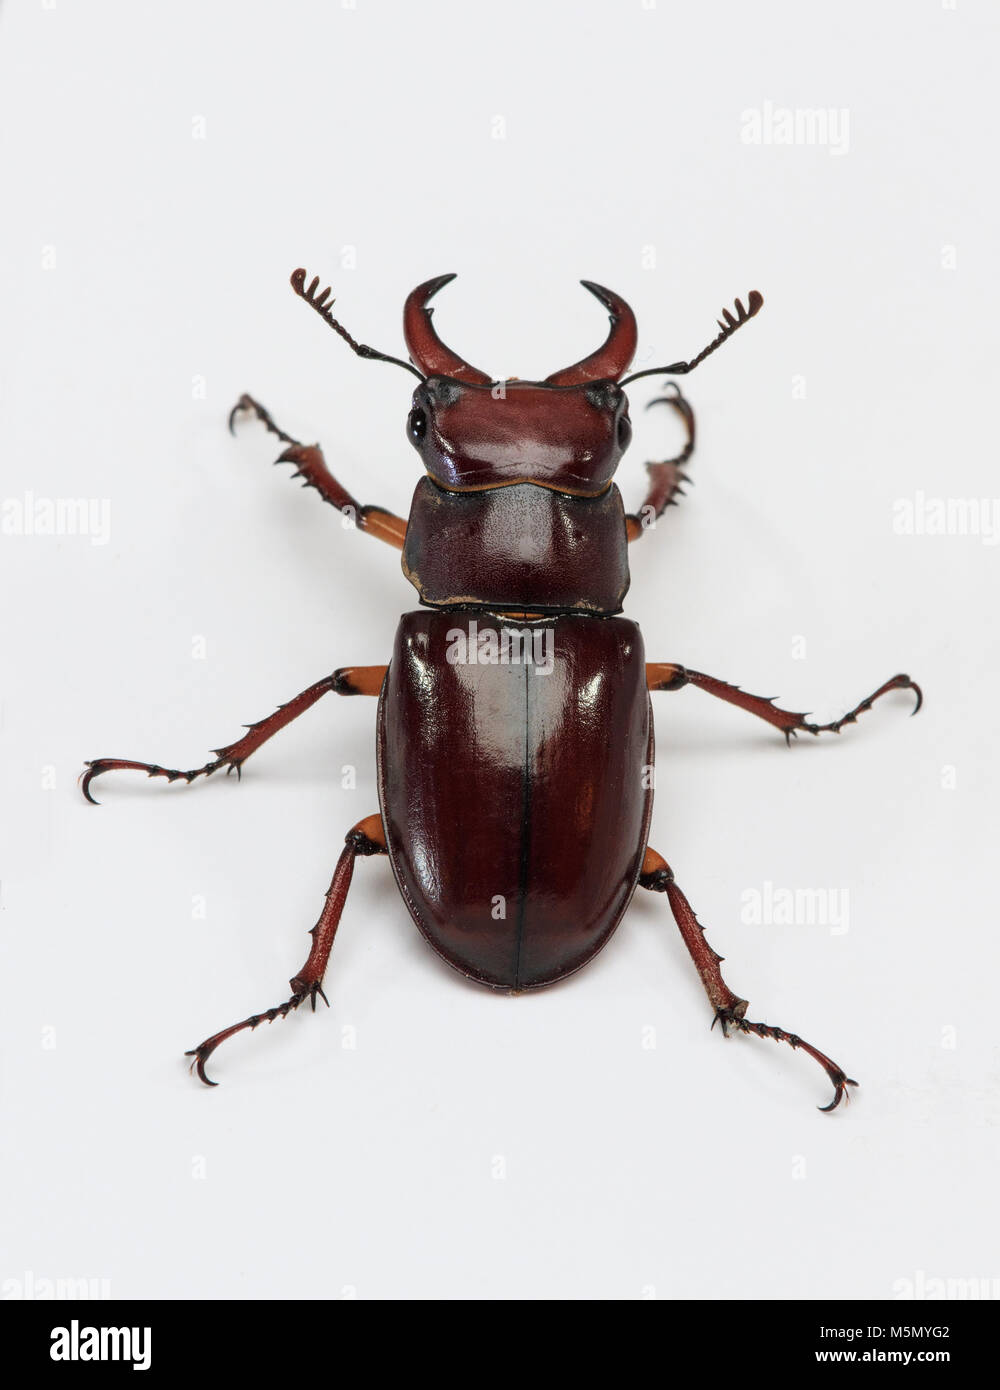 Reddish-brown Stag Beetle (Lucanus capreolus) Captive studio image - Stock Image